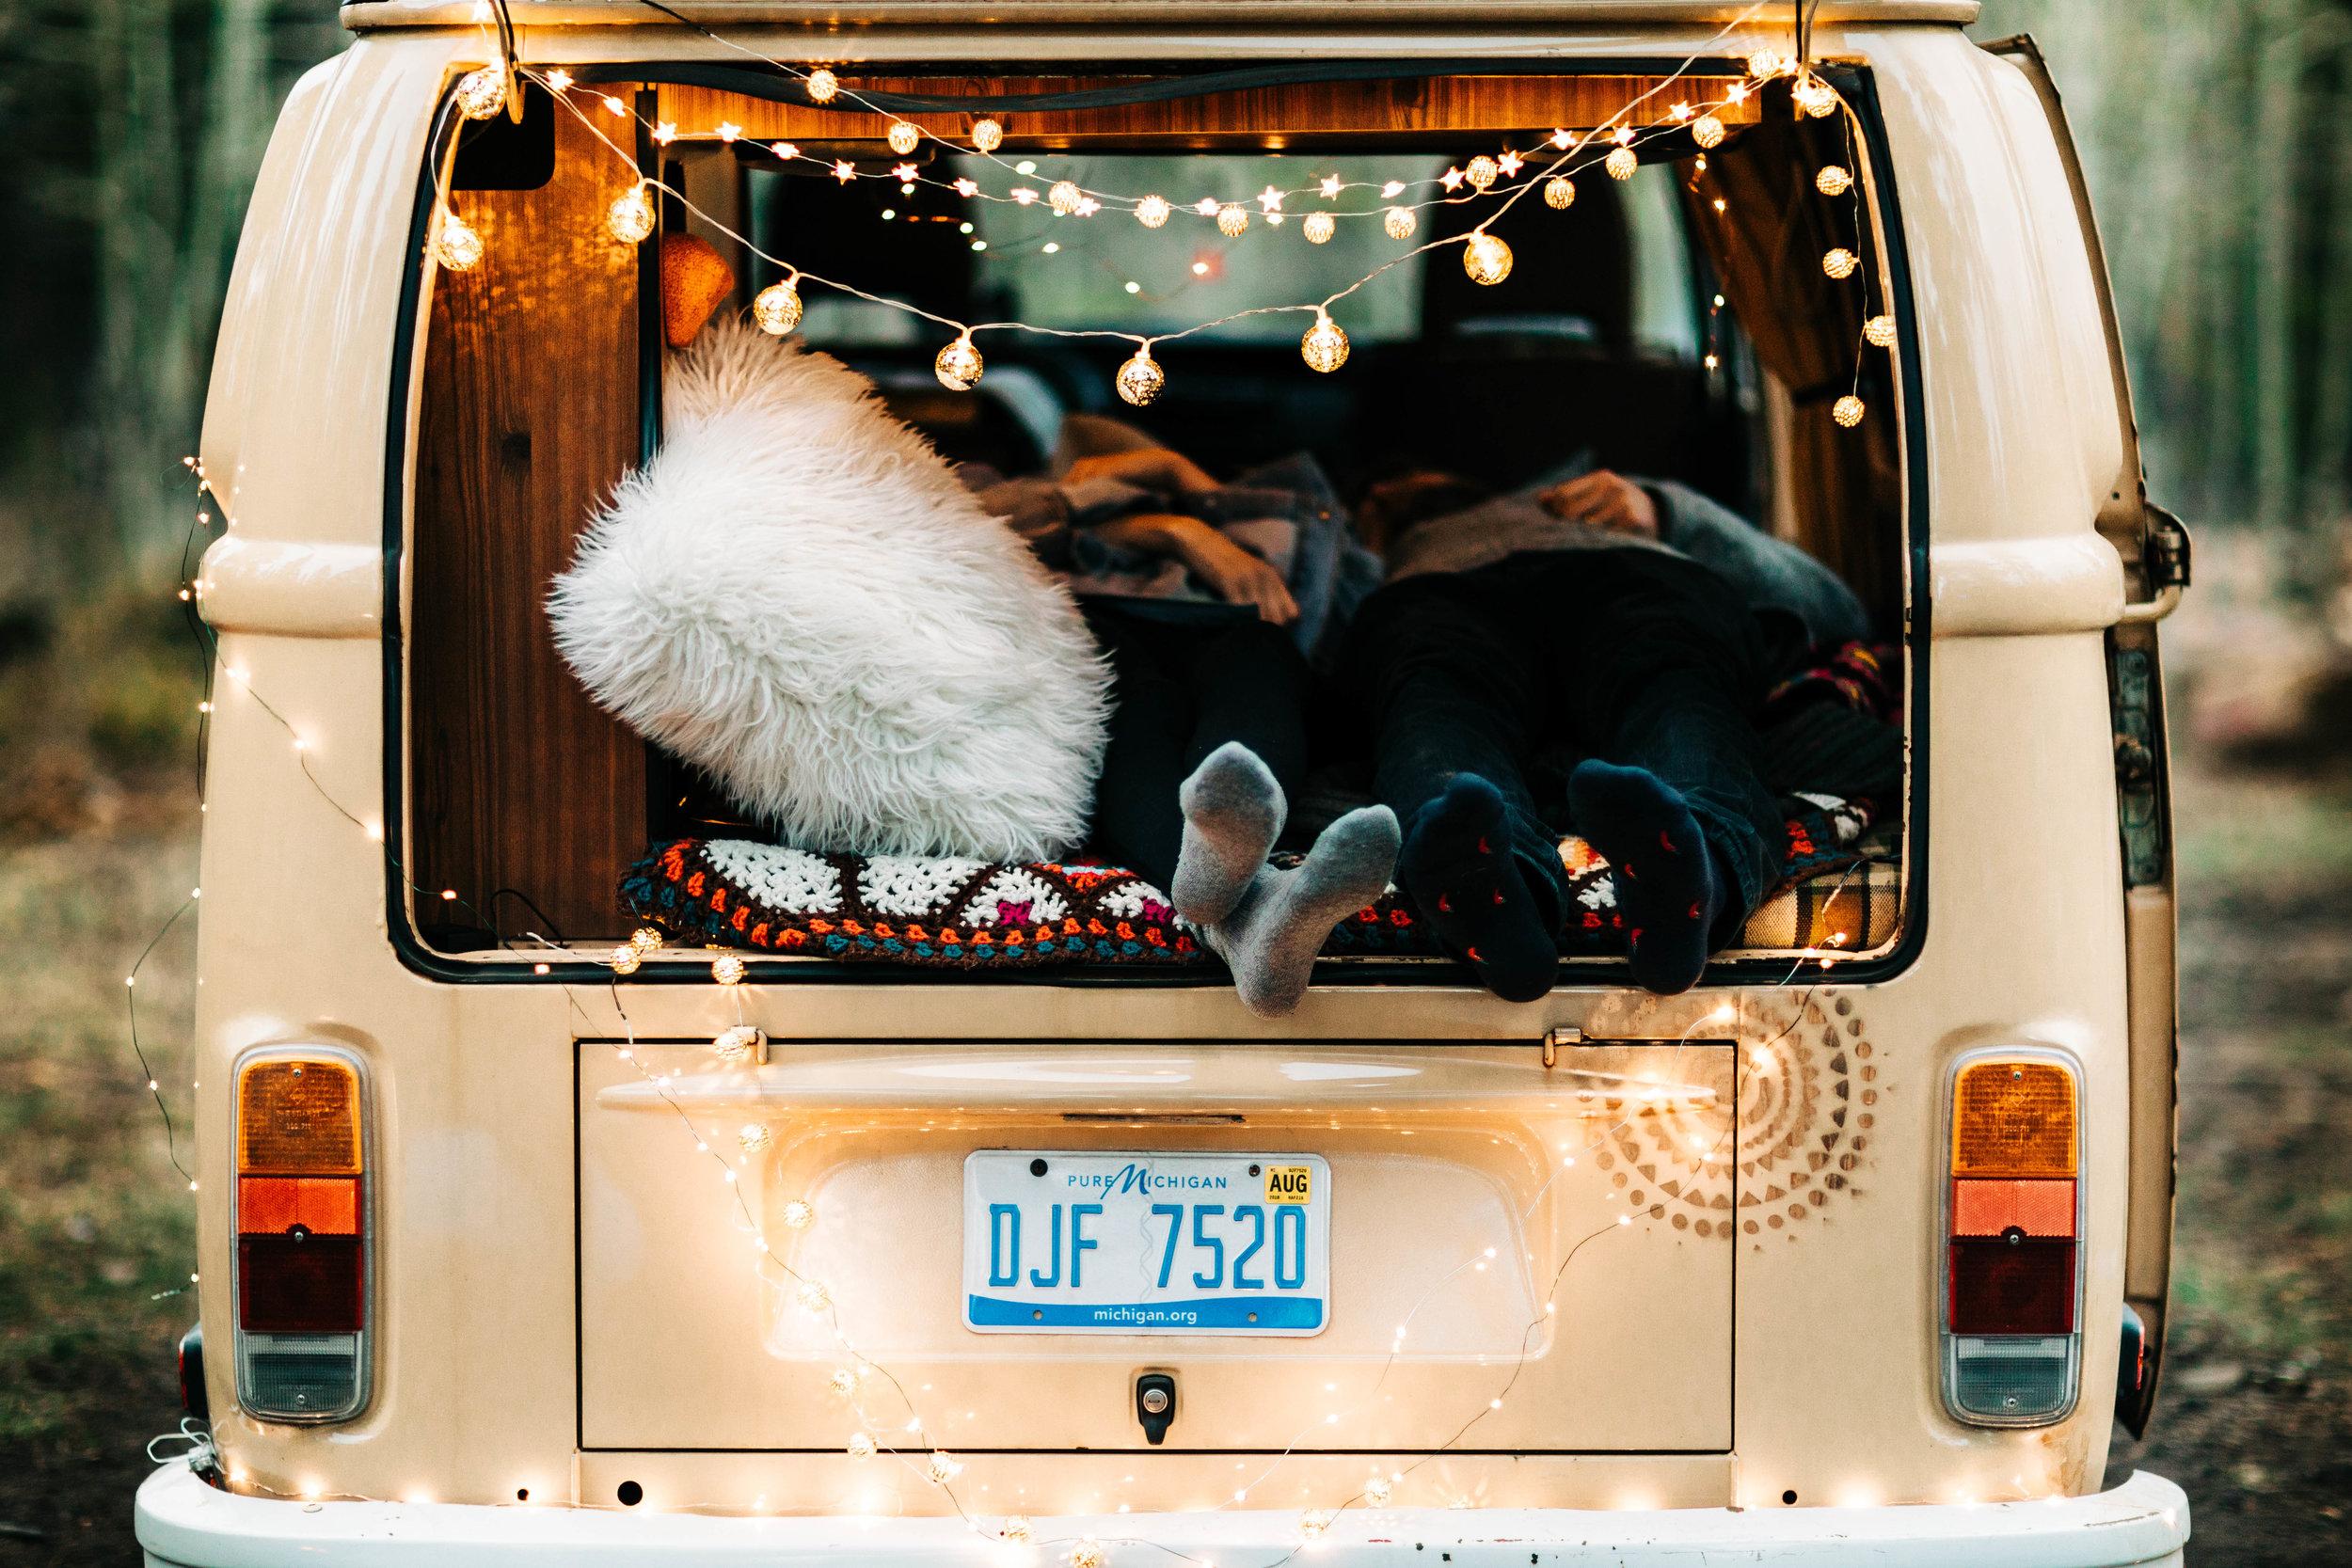 elopement photos inside a vintage camper van | van life traveling elopement photographers